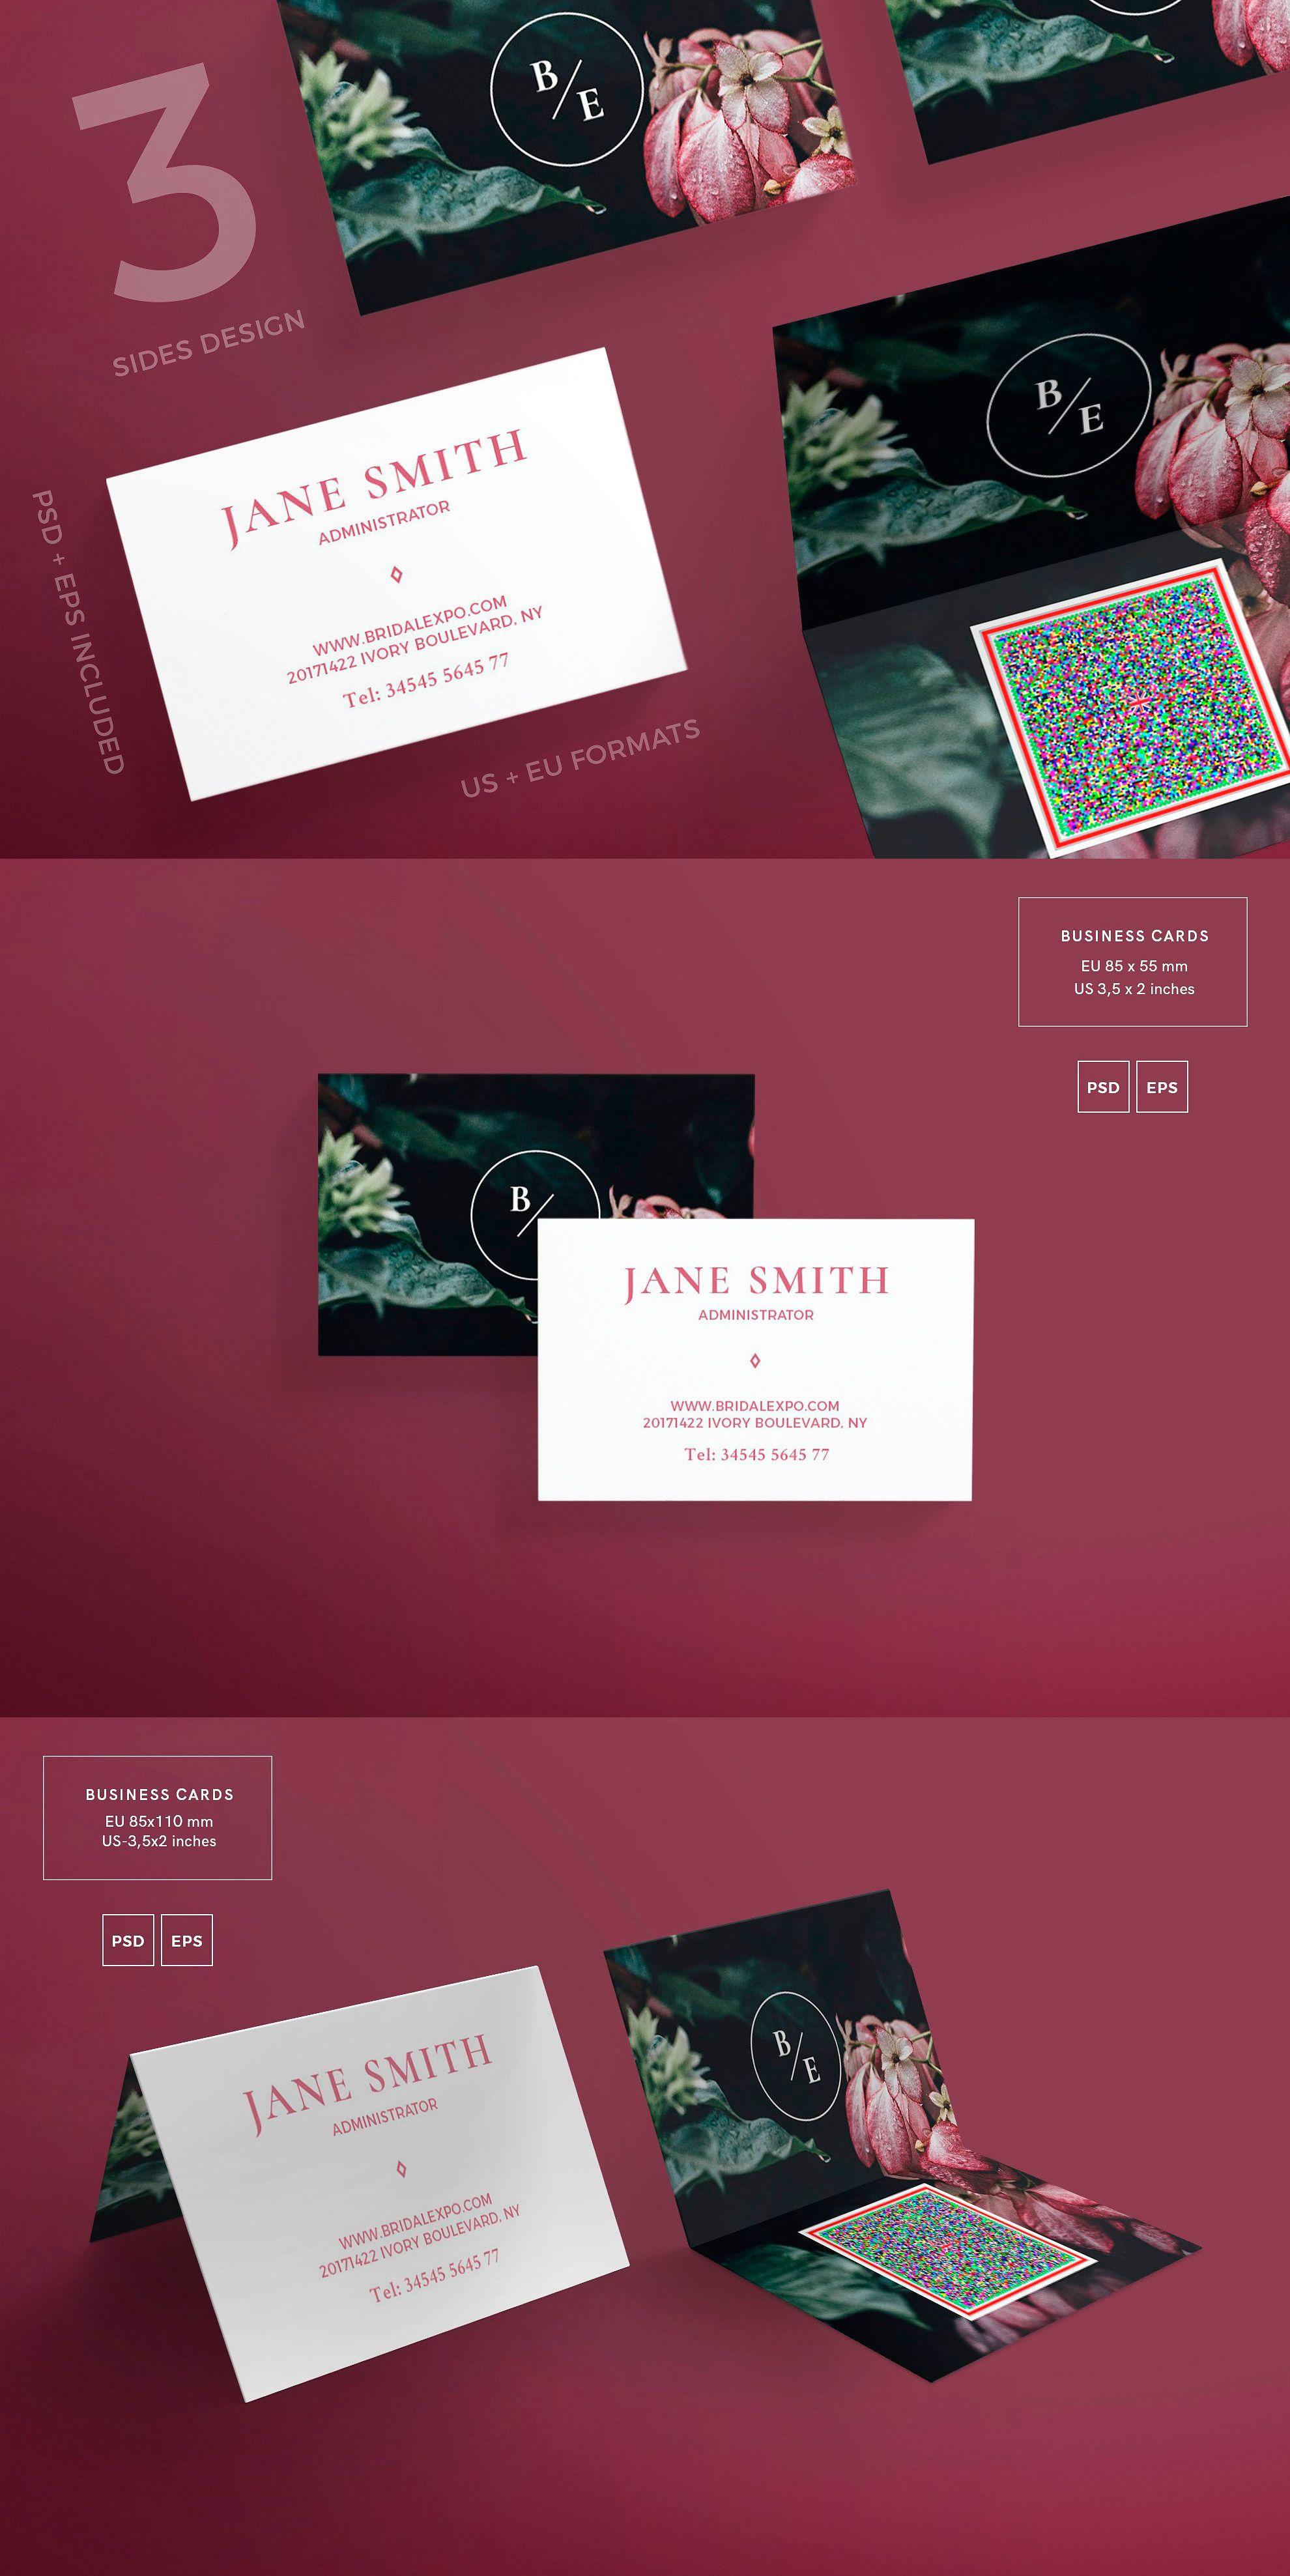 Business cards template bridal expo pdf jpg business card business cards template bridal expo pdf jpg friedricerecipe Images